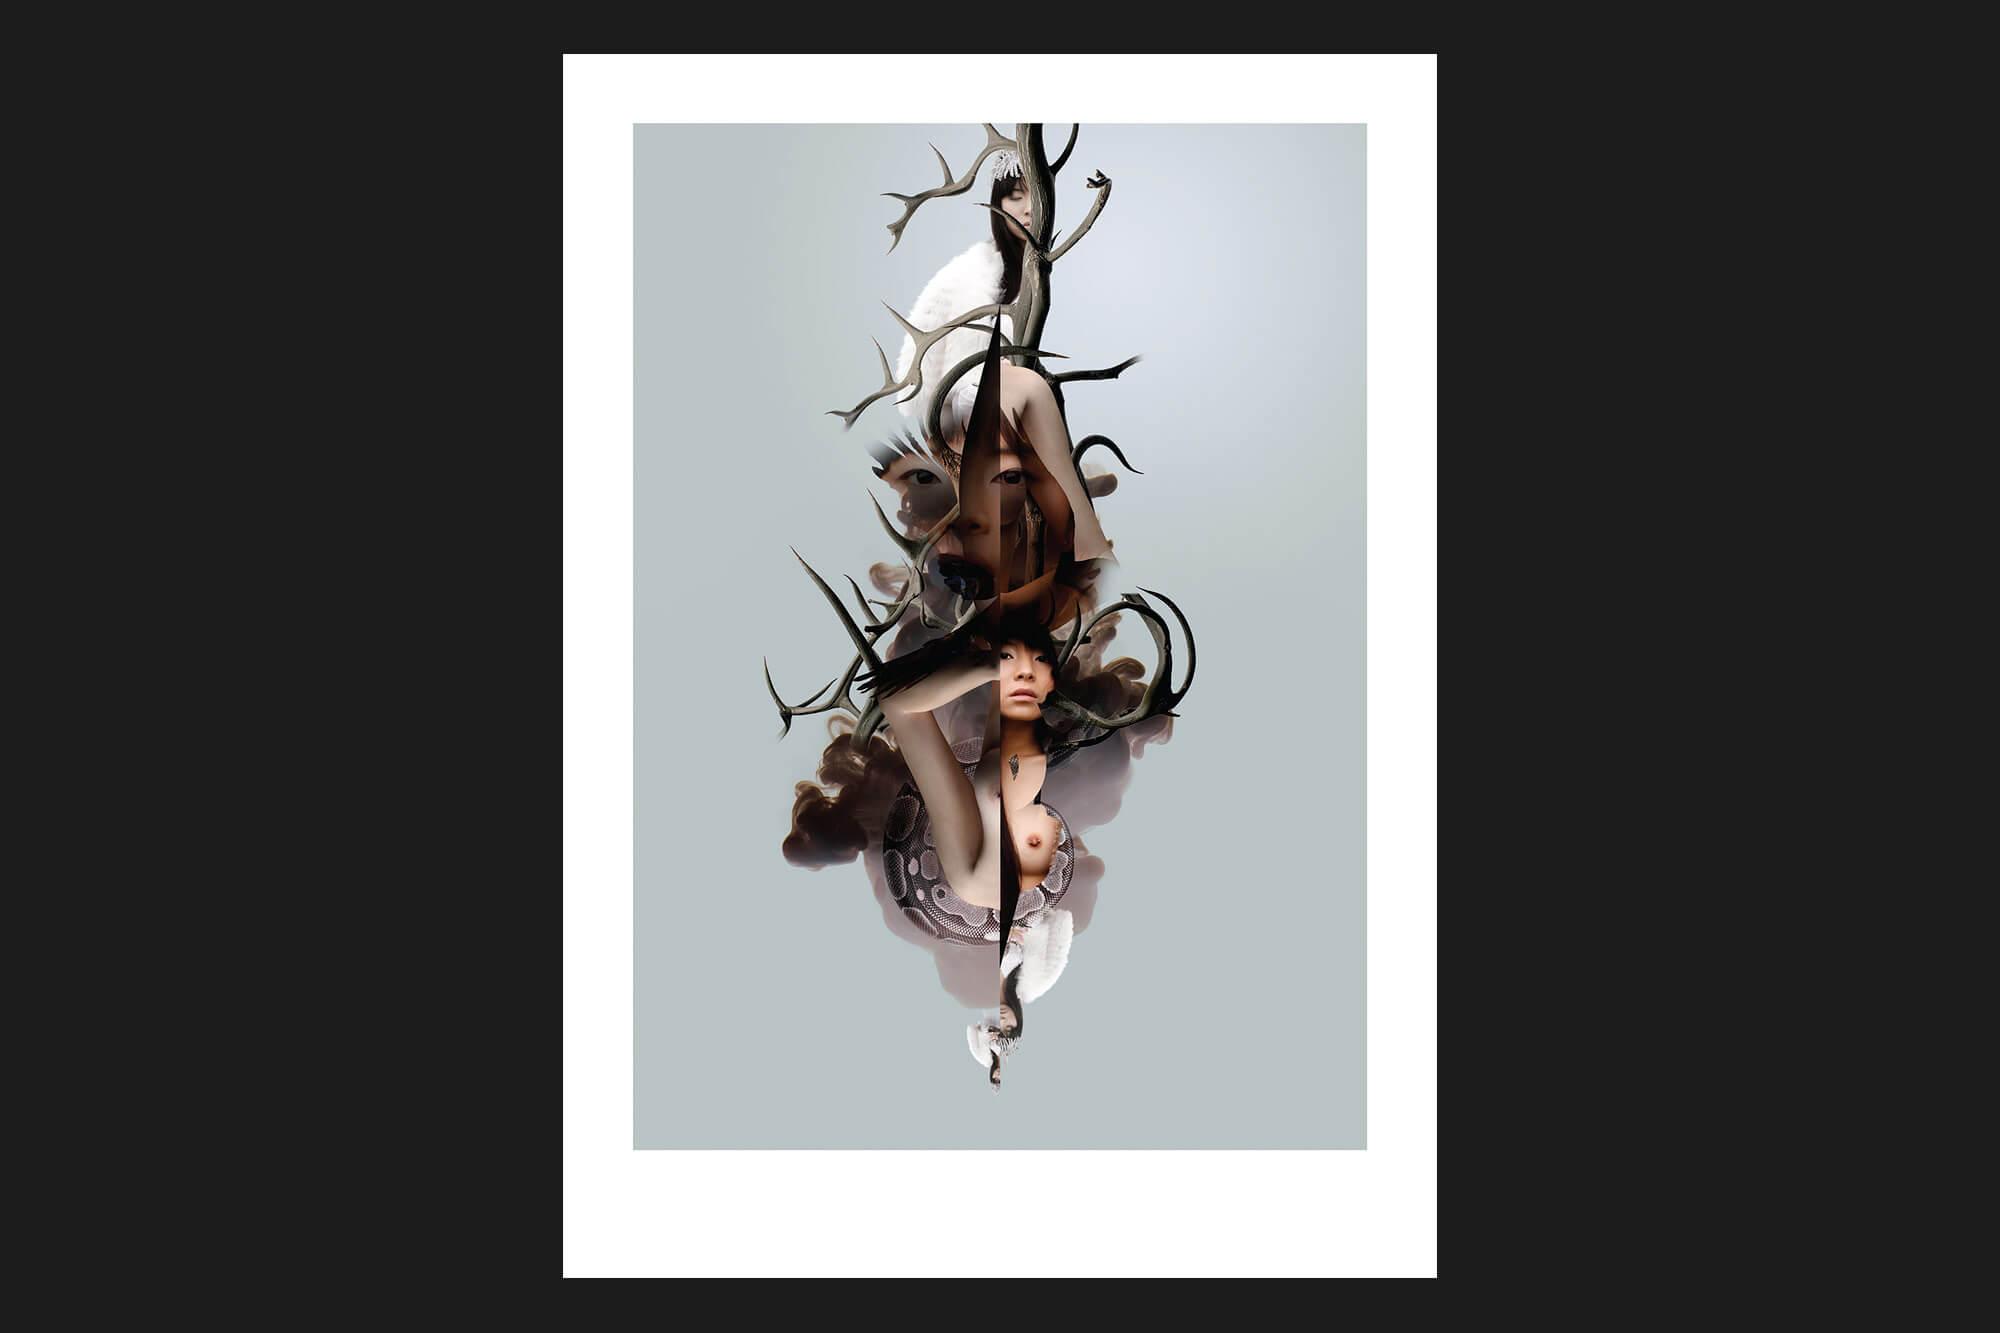 gareth-paul-jones-studio-design-neringa-rekasiute-photography-7788-art-identity-series-cs-07